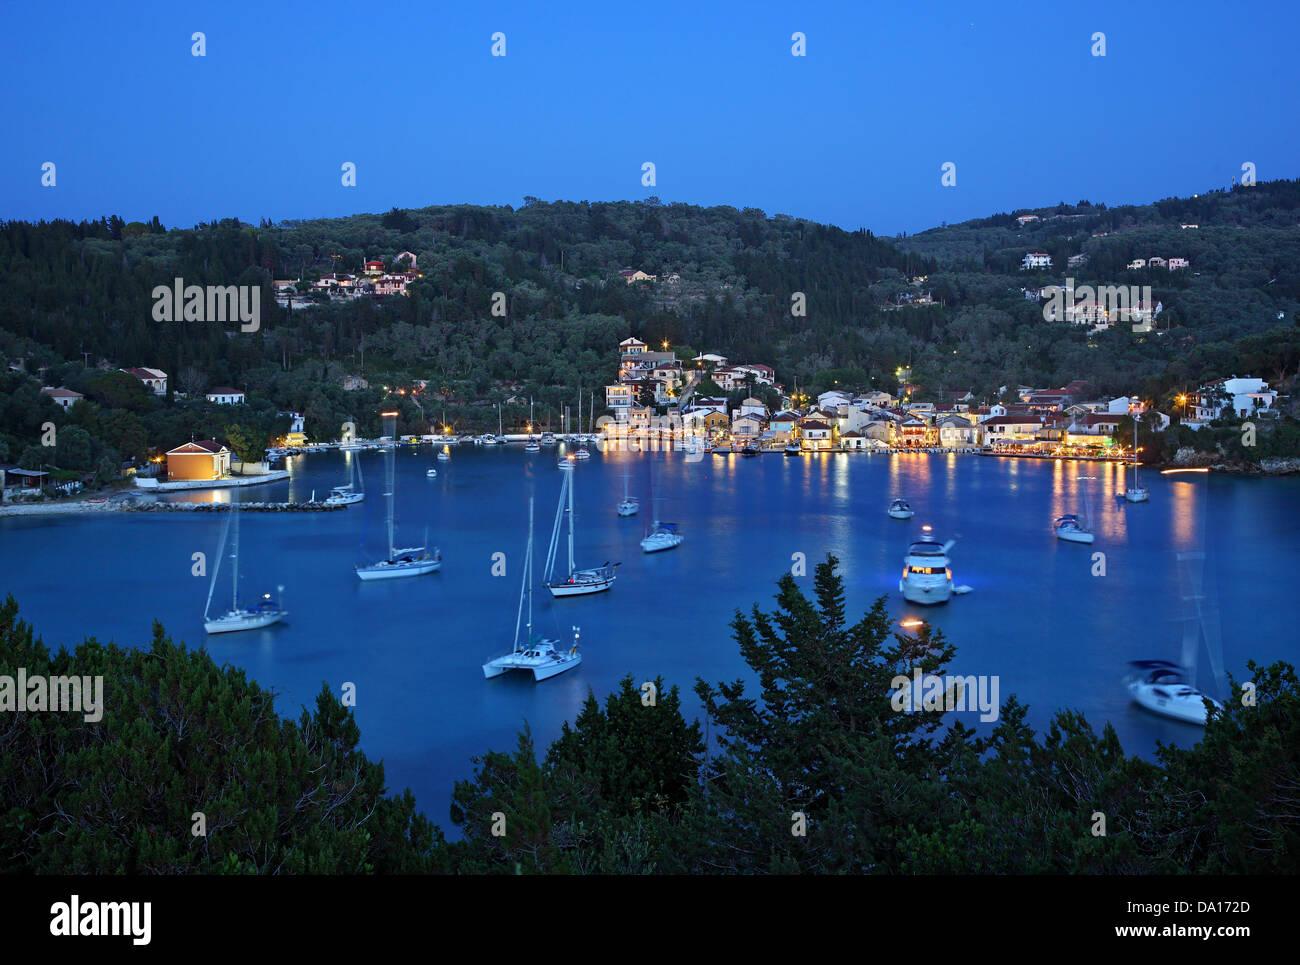 Night view of Lakka bay and village, Paxos island, Ionian Sea, Eptanisa ('Seven Islands'), Greece. - Stock Image